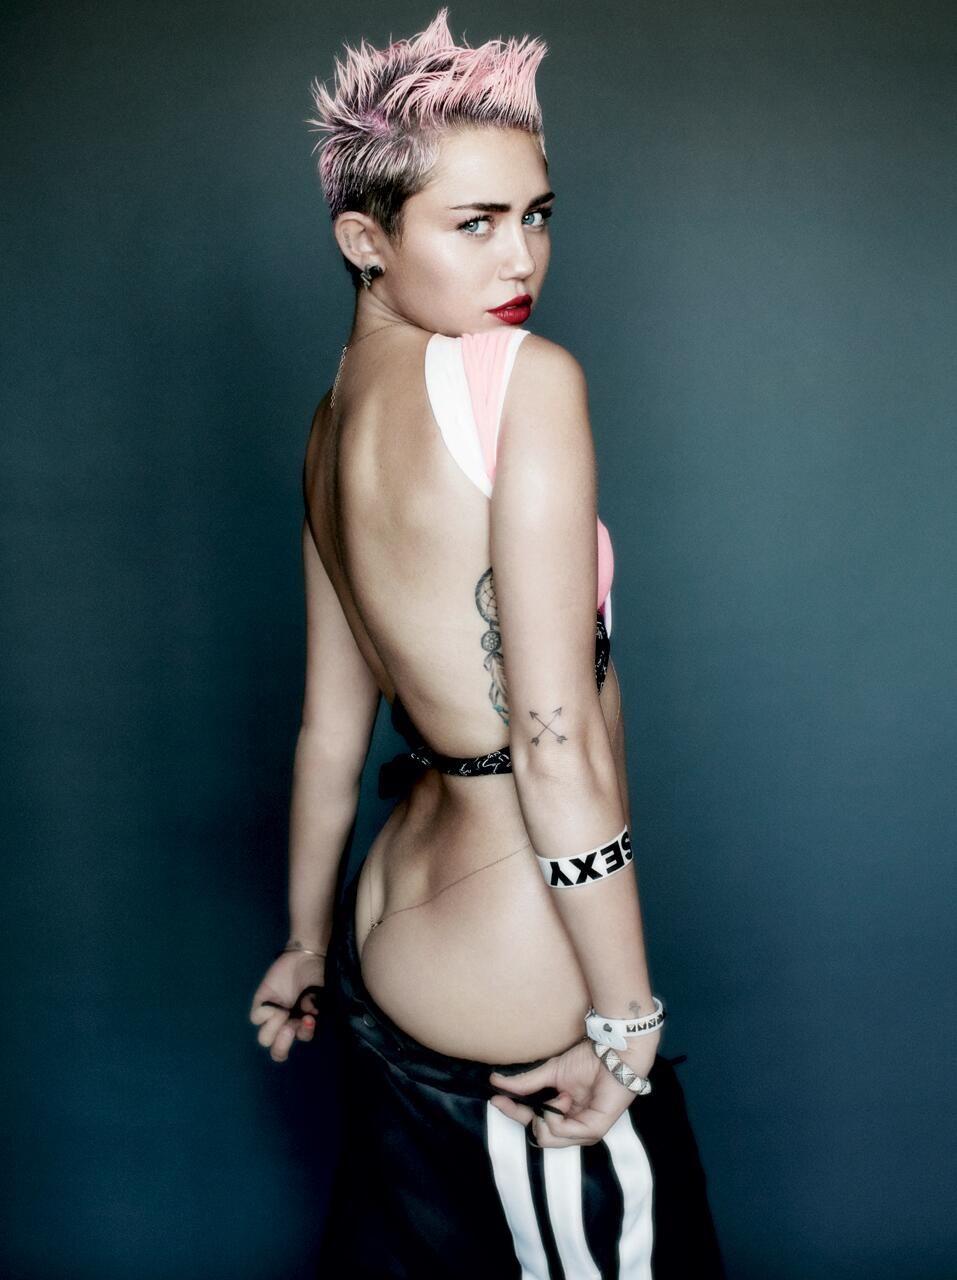 Erotica Miley Cyrus nudes (43 photos), Ass, Bikini, Instagram, braless 2006